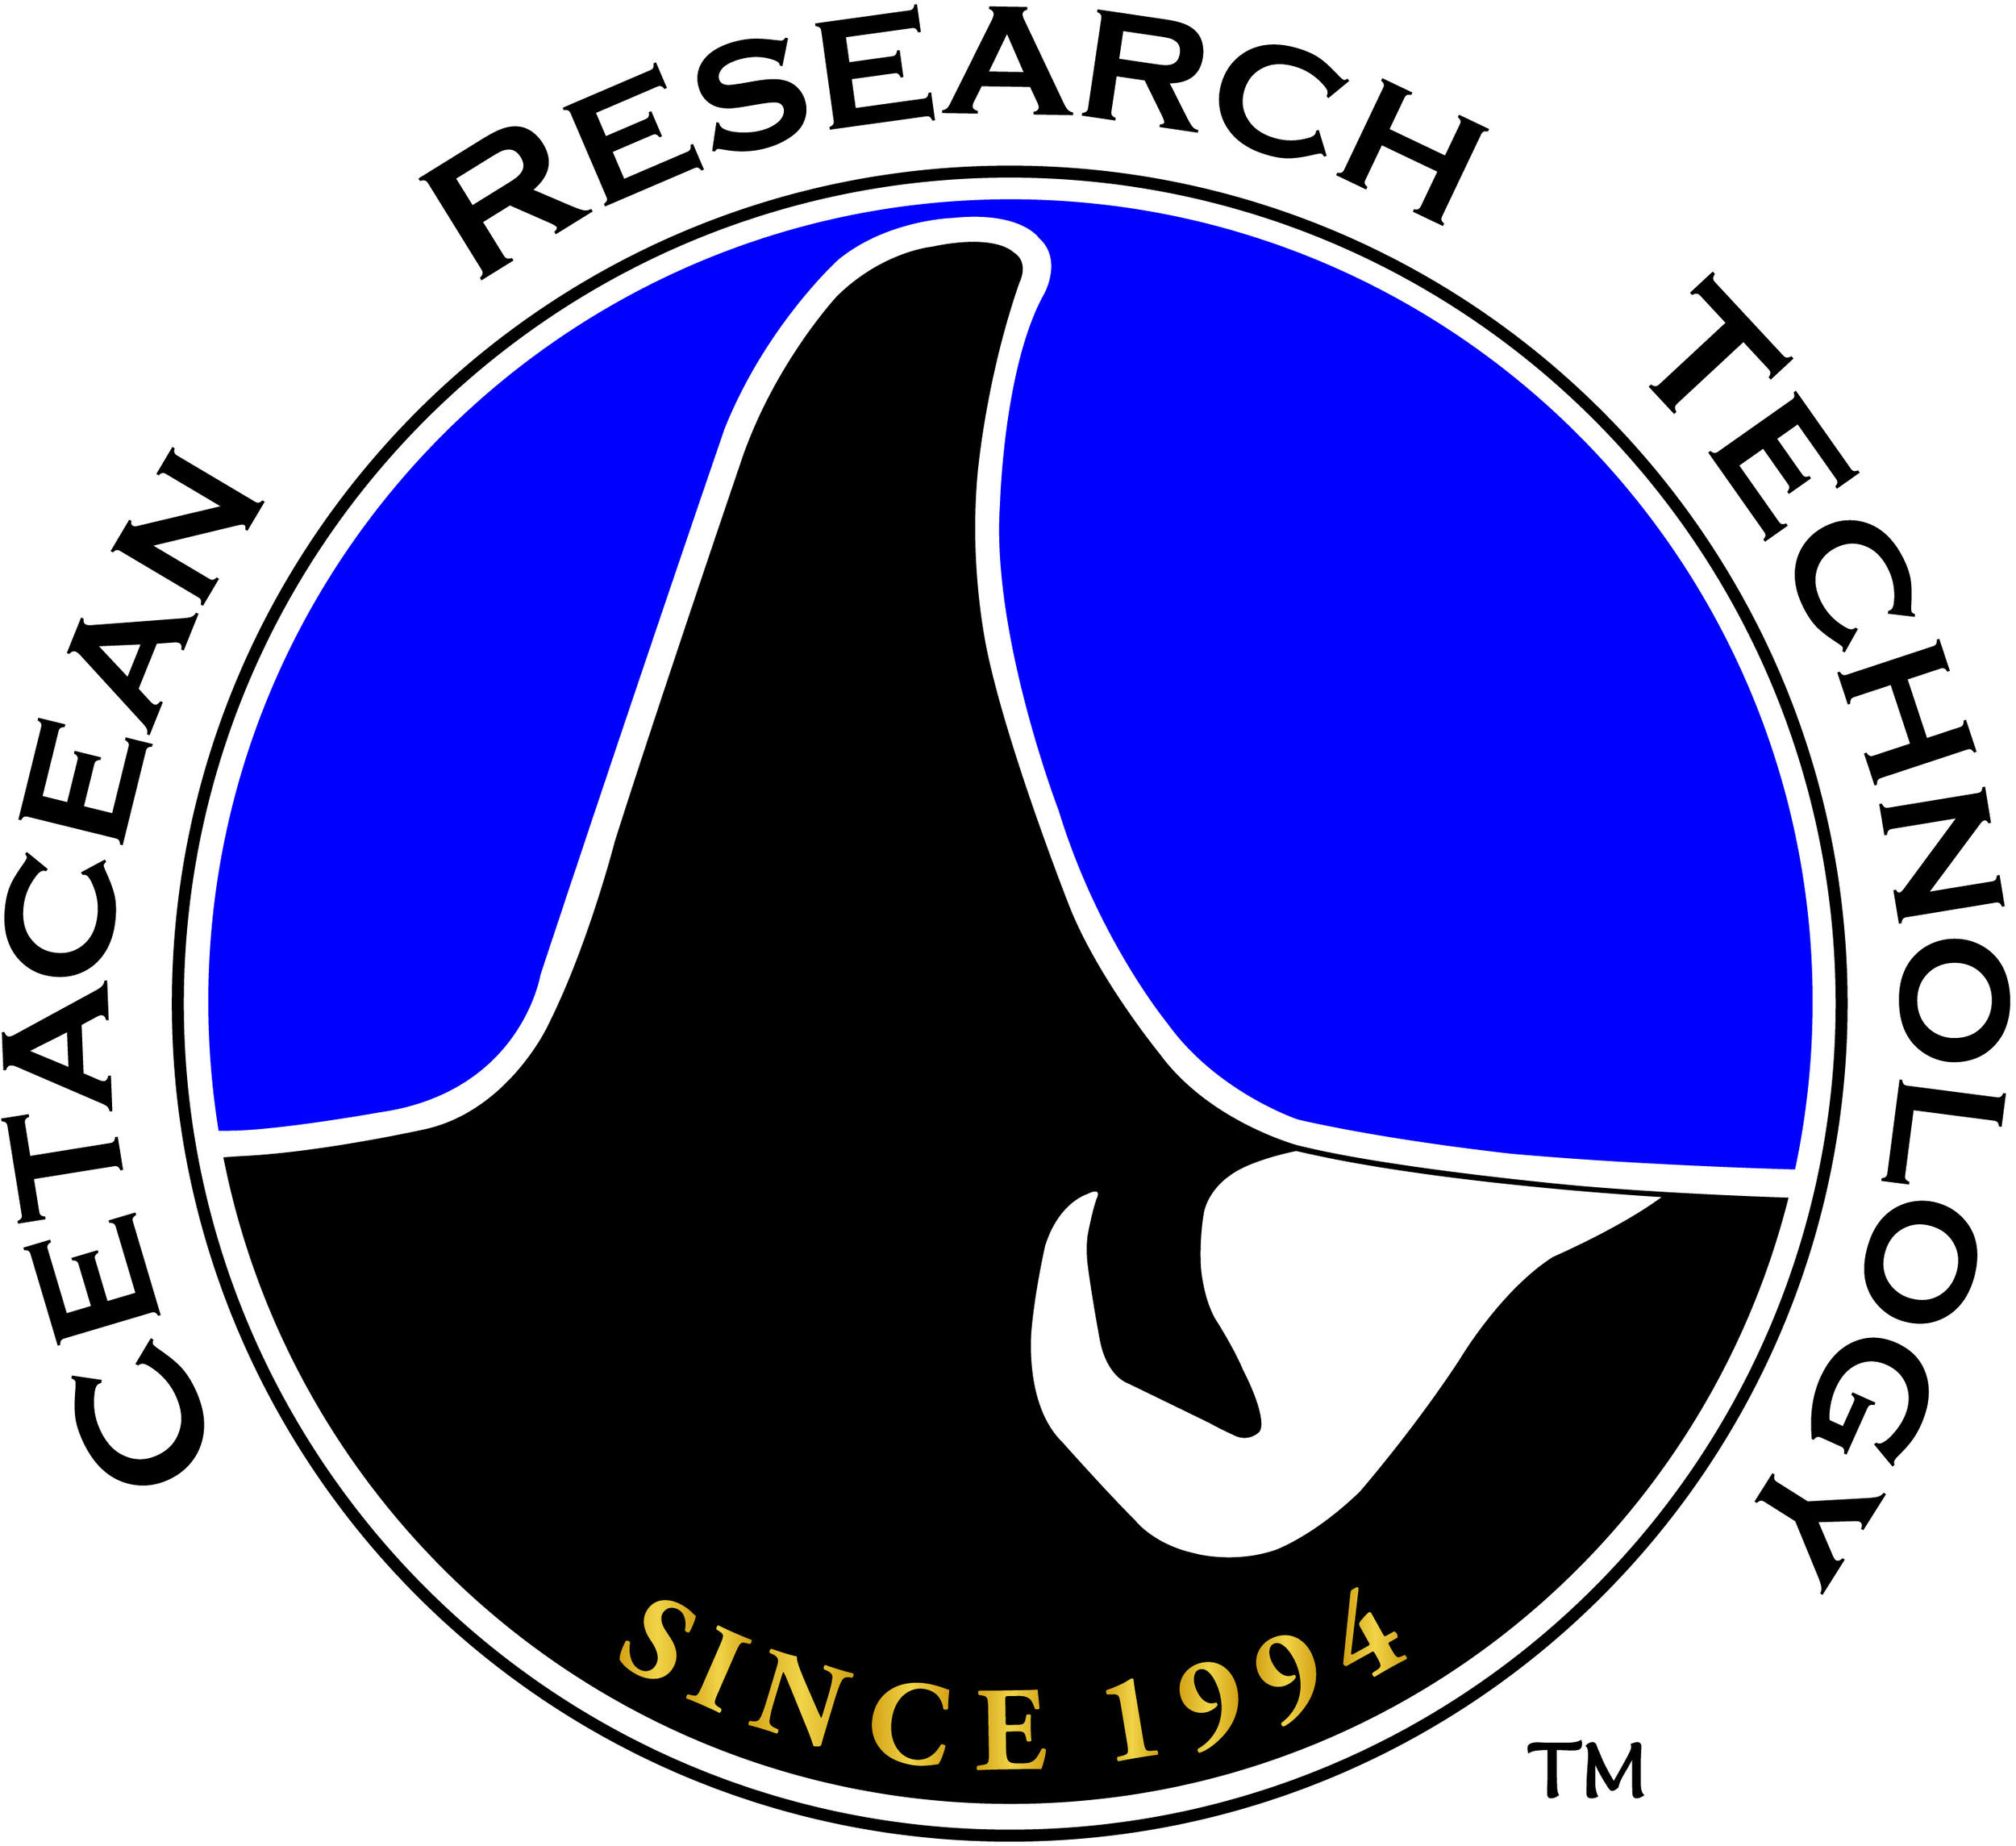 Cetacean Research Technology logo.jpg